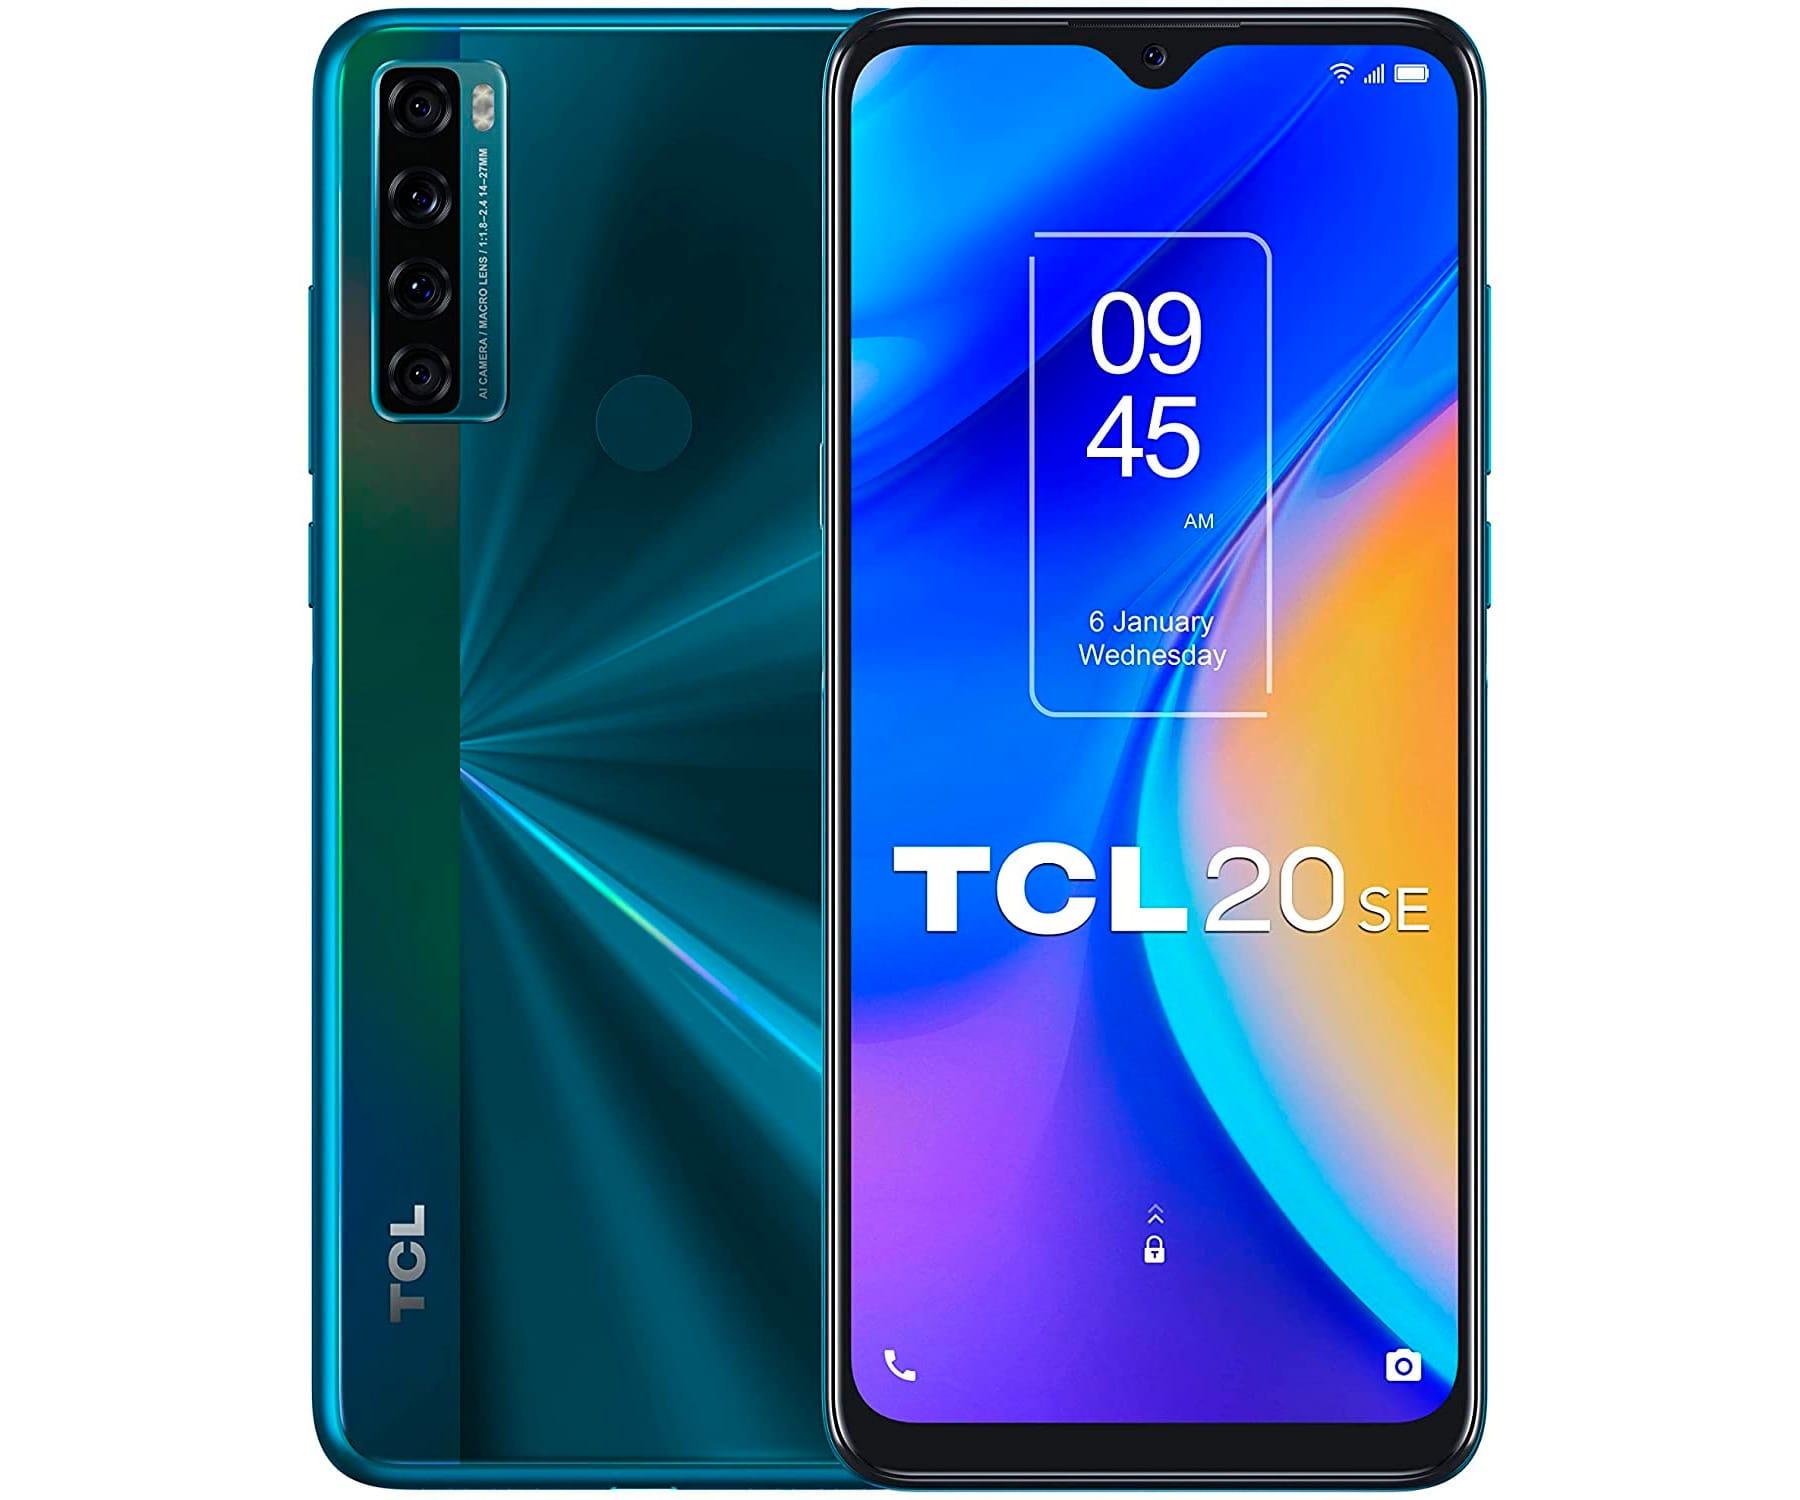 TCL 20 SE VERDE MÓVIL 4G DUAL SIM 6.82'' HD+ OCTACORE 64GB 4GB RAM QUADCAM 16MP SELFIES 8MP